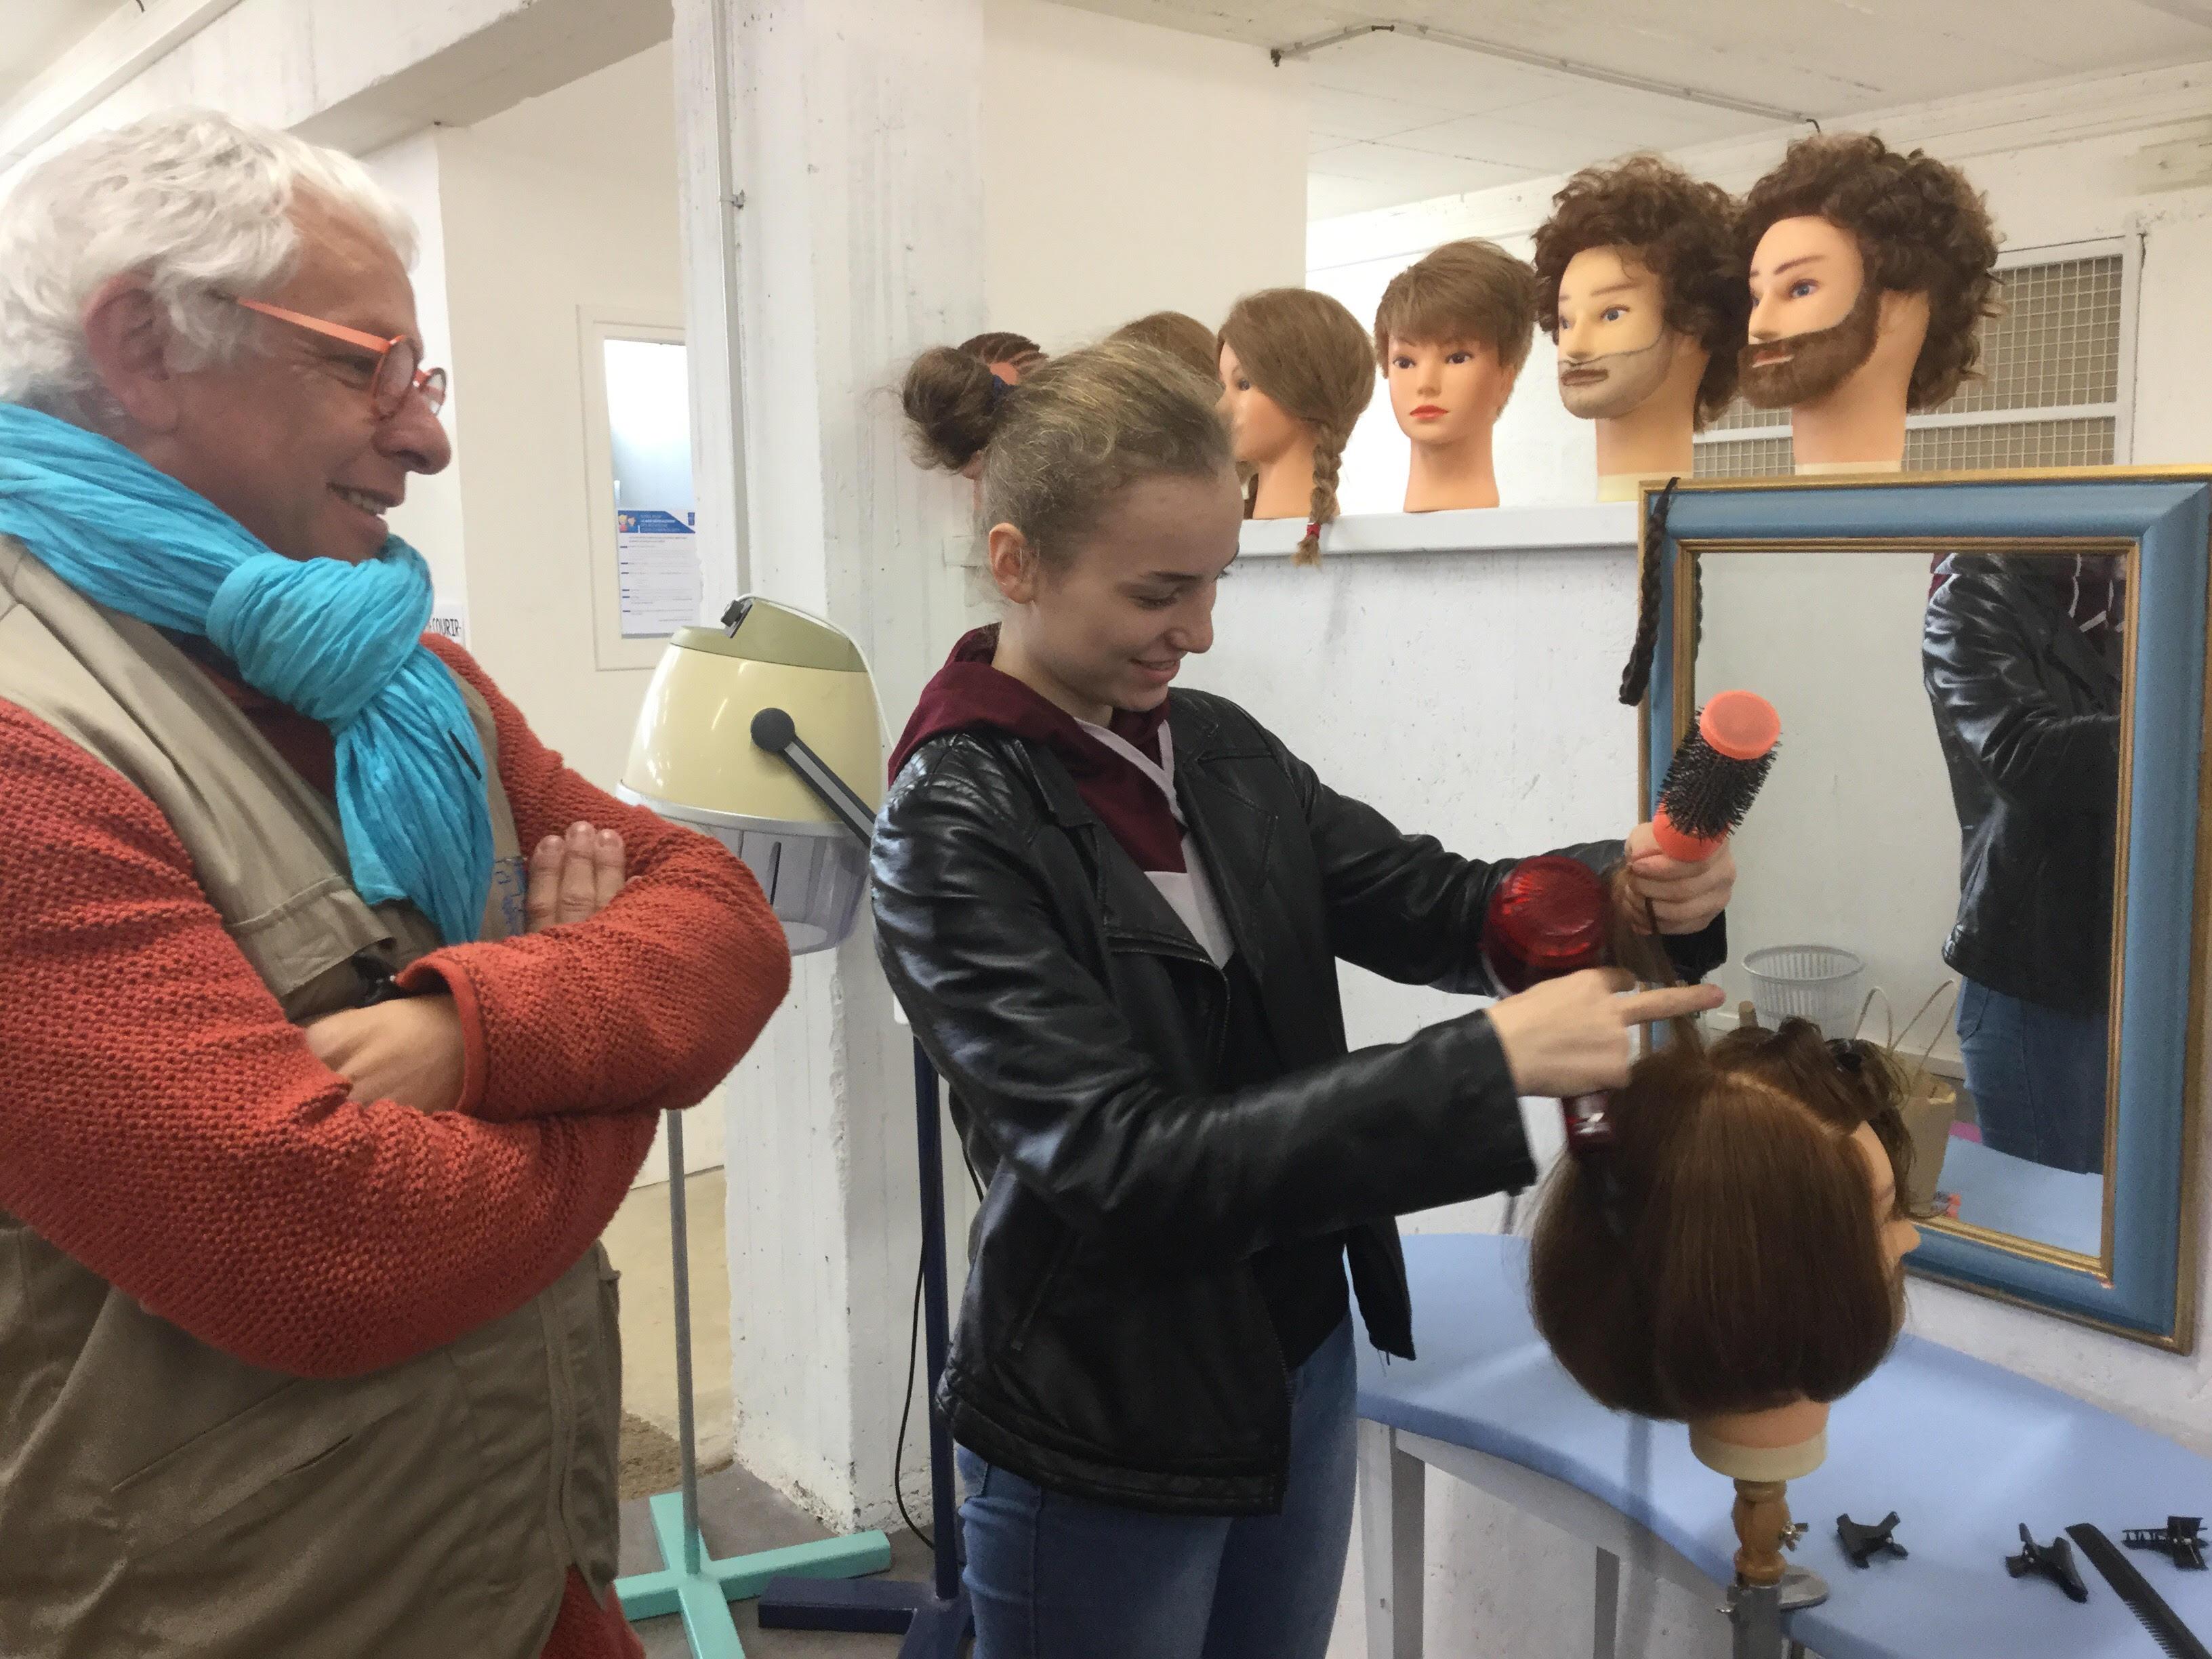 atelier-coiffure-lycee-saint-louis-auray-grand-champ